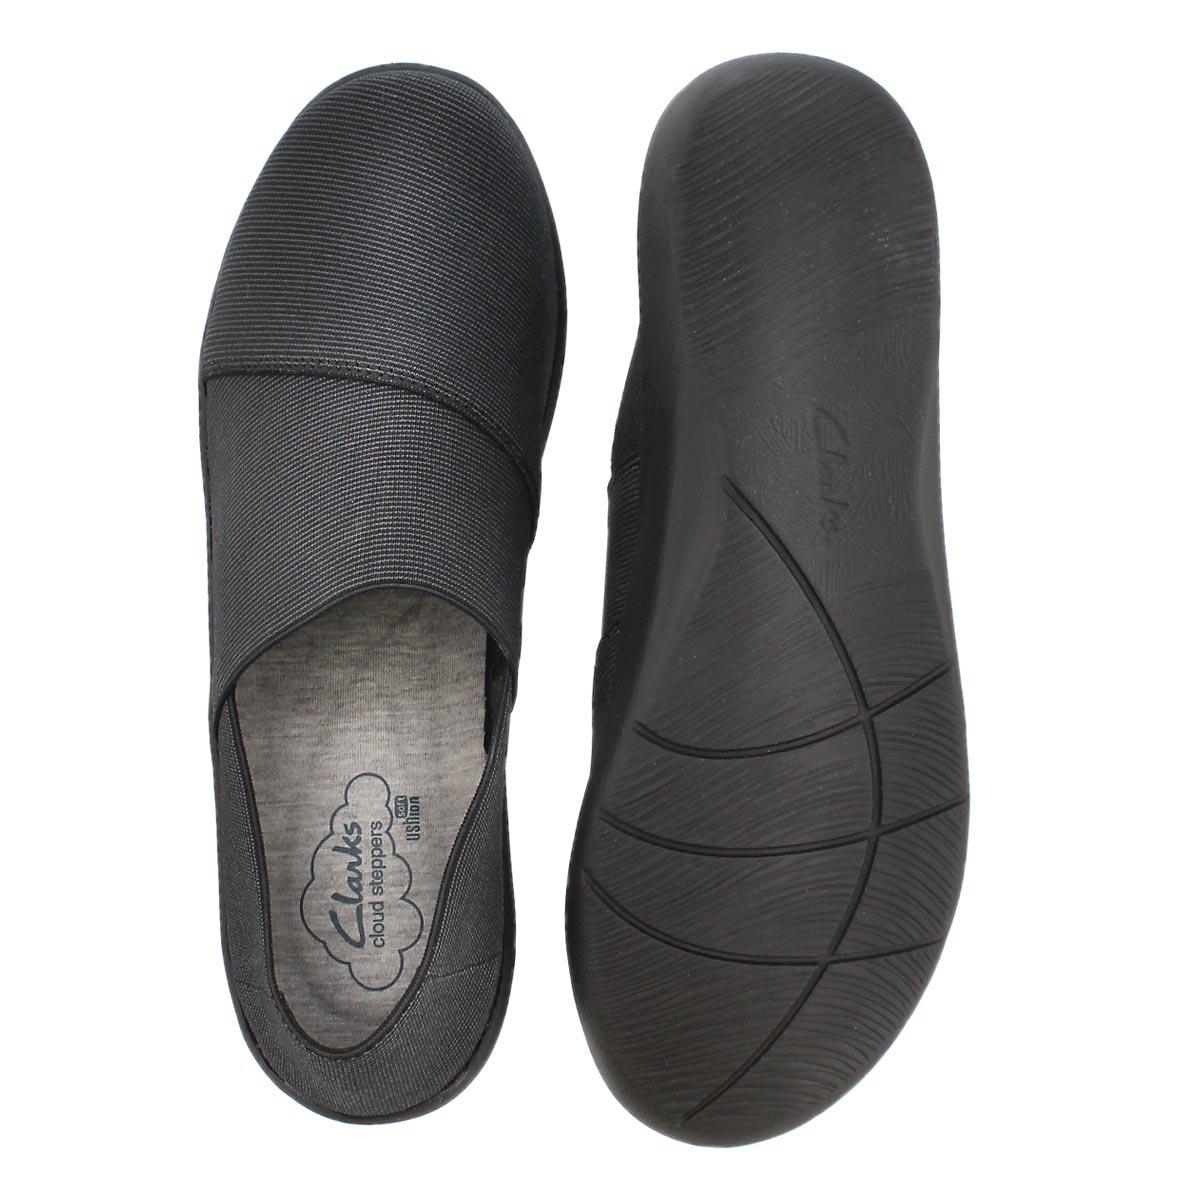 Lds Sillian Firn black casual slip on